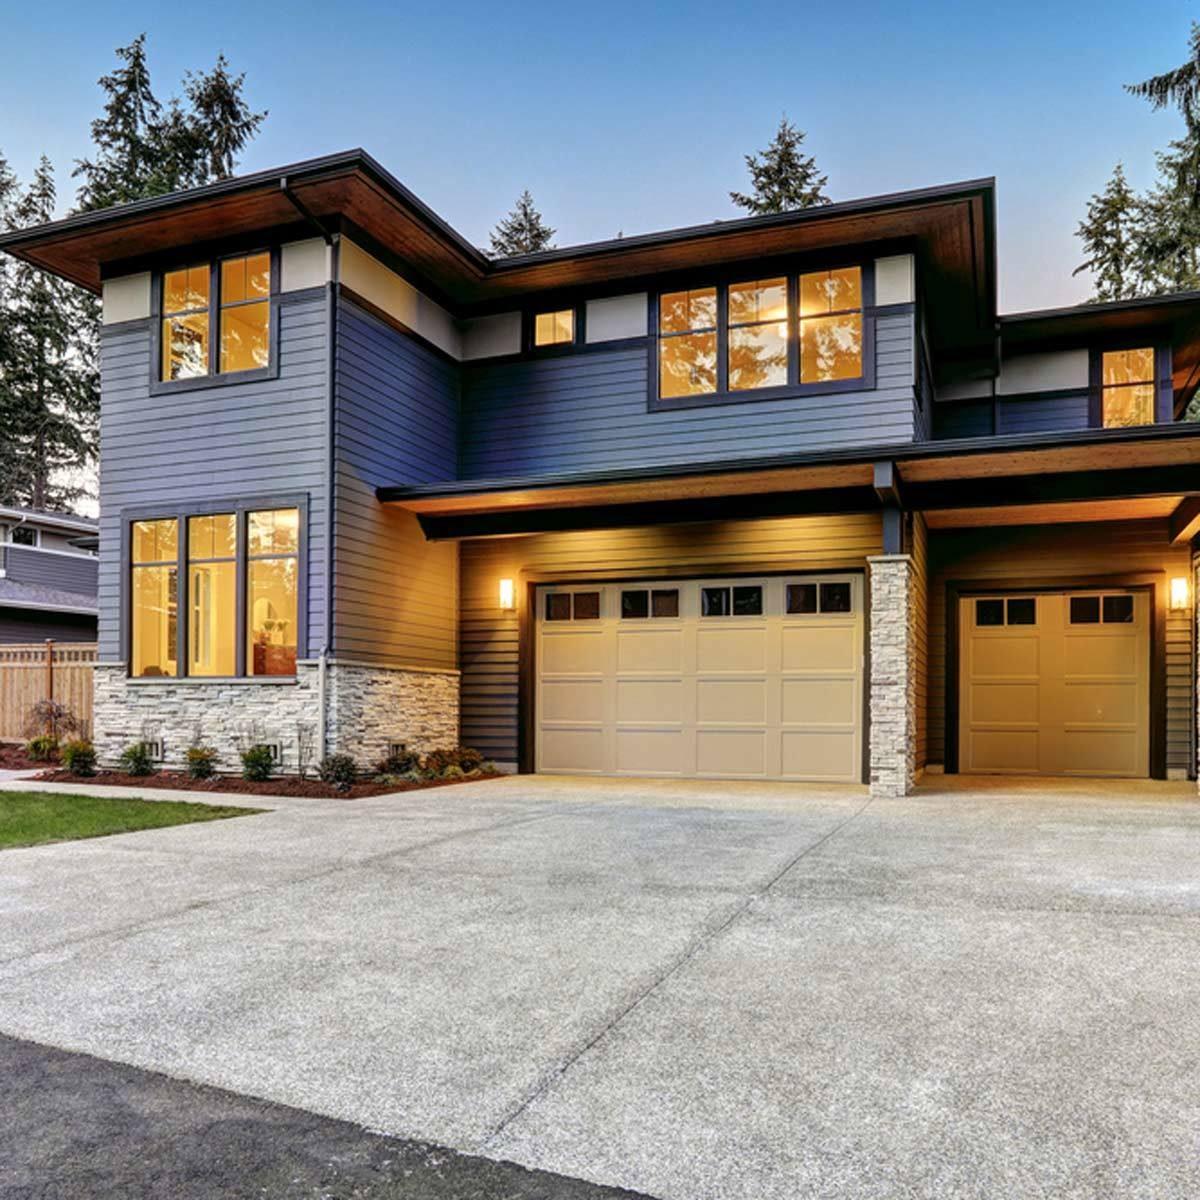 blue gray exterior color modern home